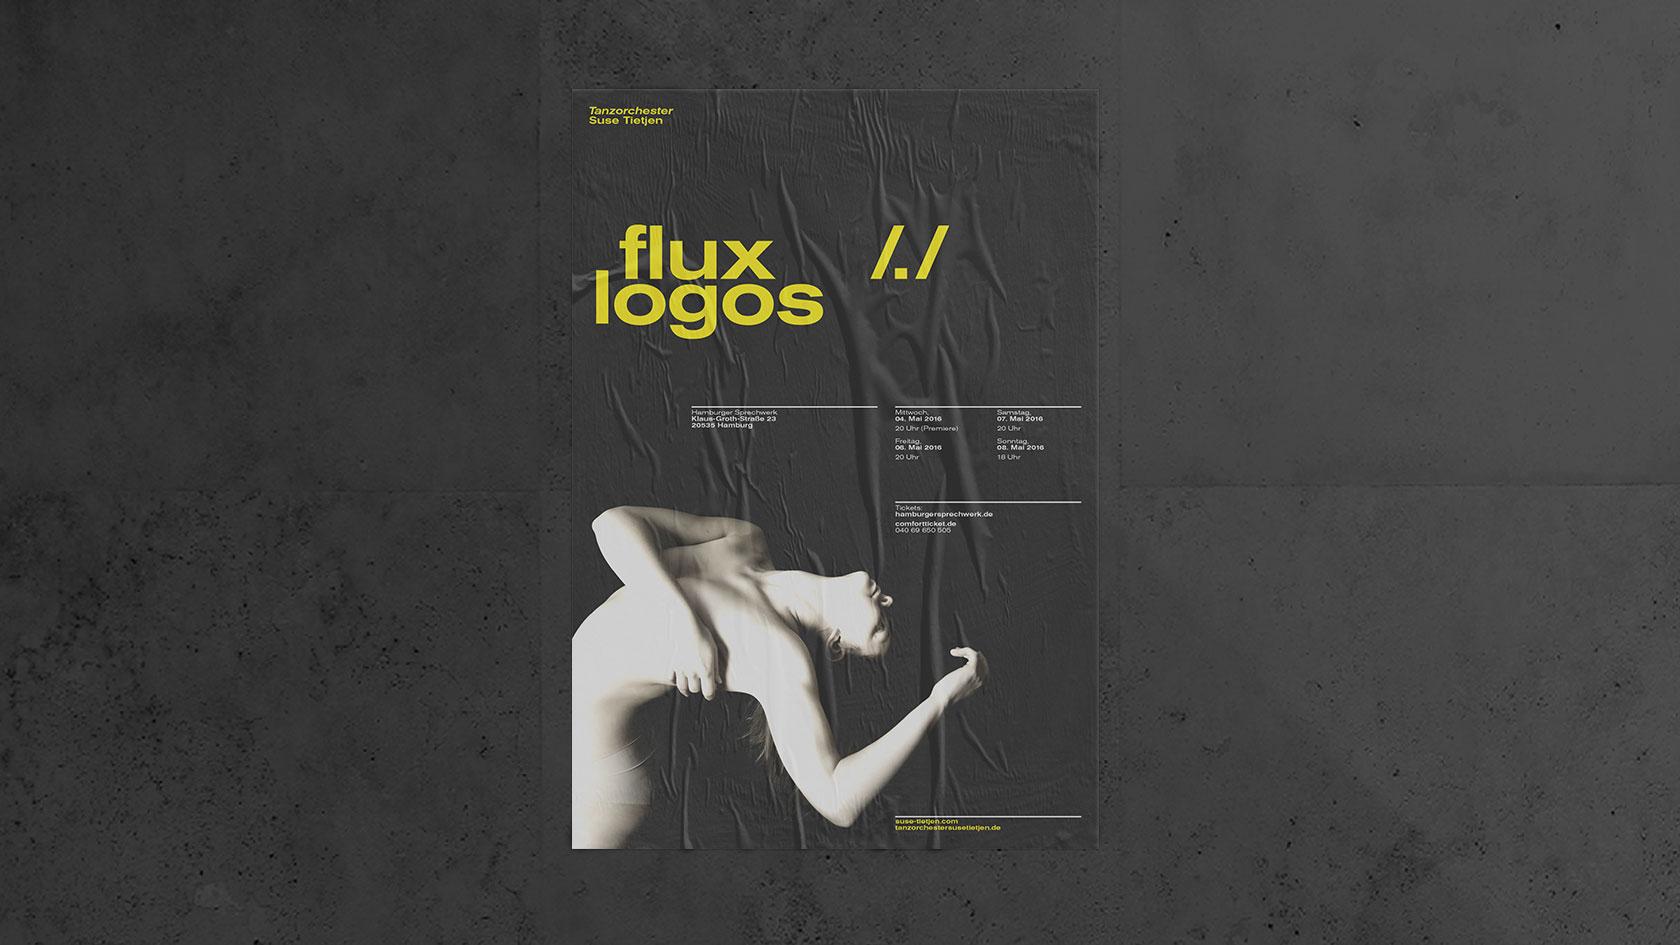 Flux_Logos-Poster-01-Mock